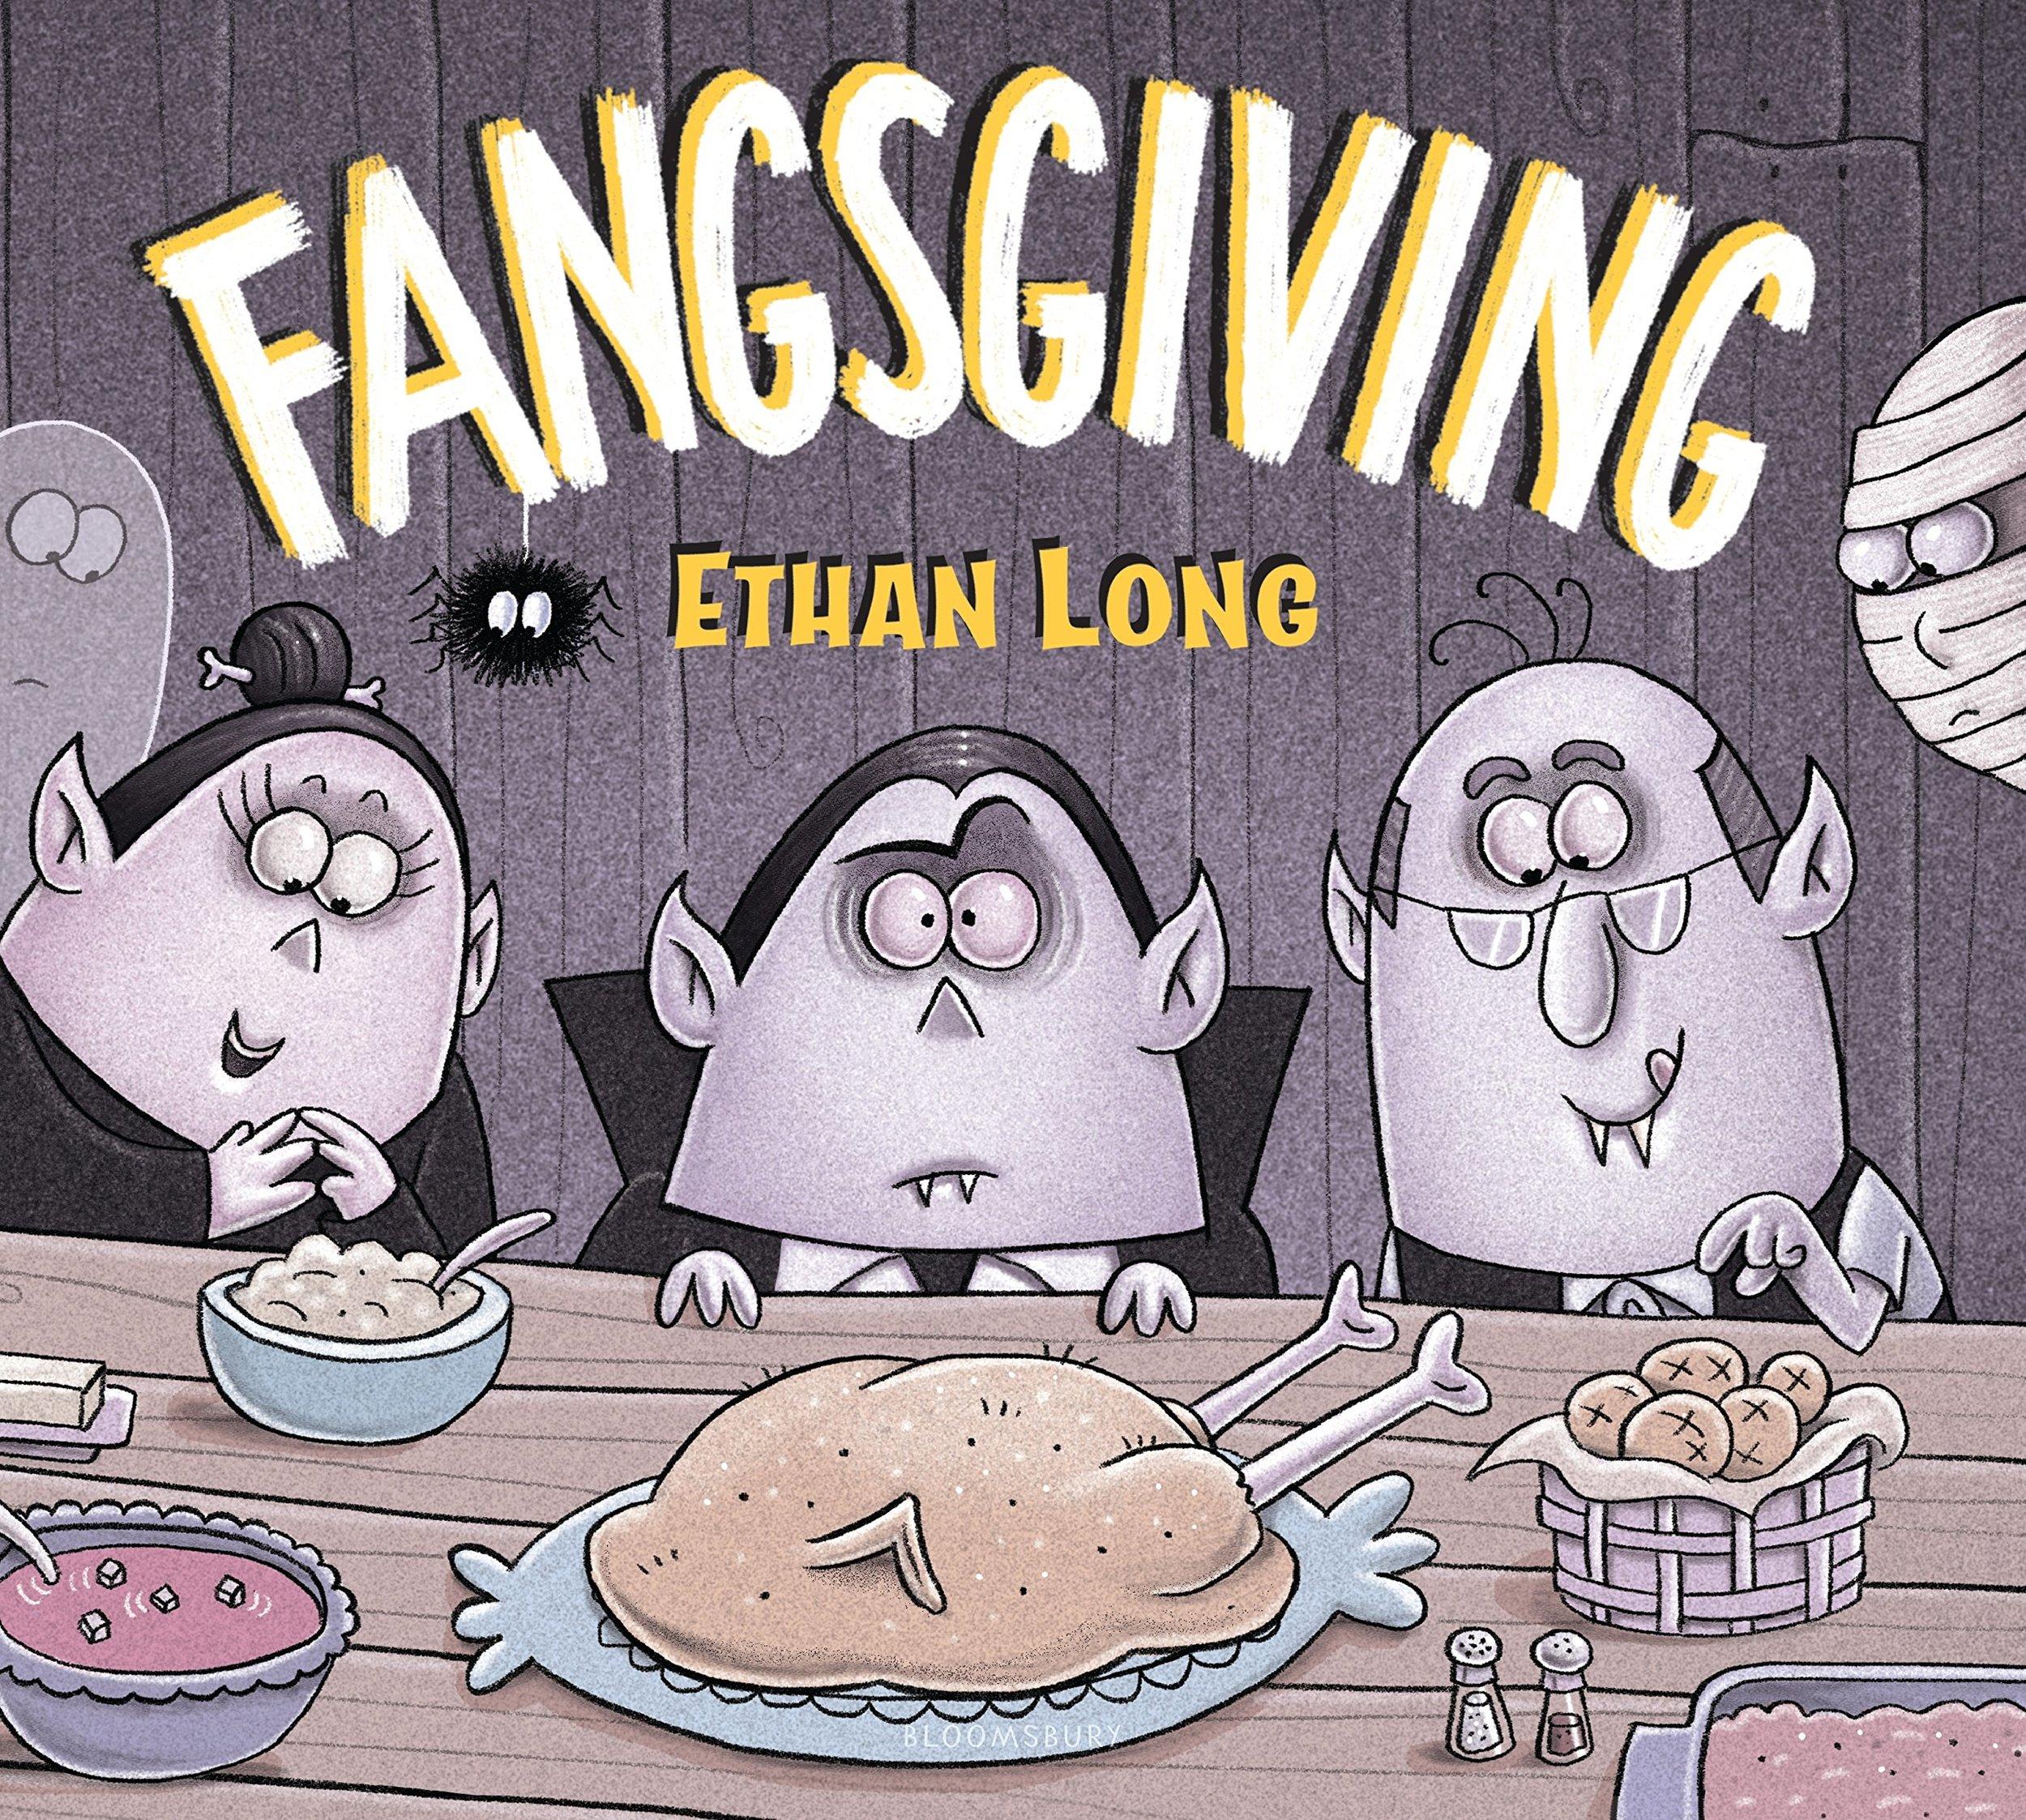 Long, Ethan 2018_09 - FANGSGIVING - PB - RLM PR.jpg